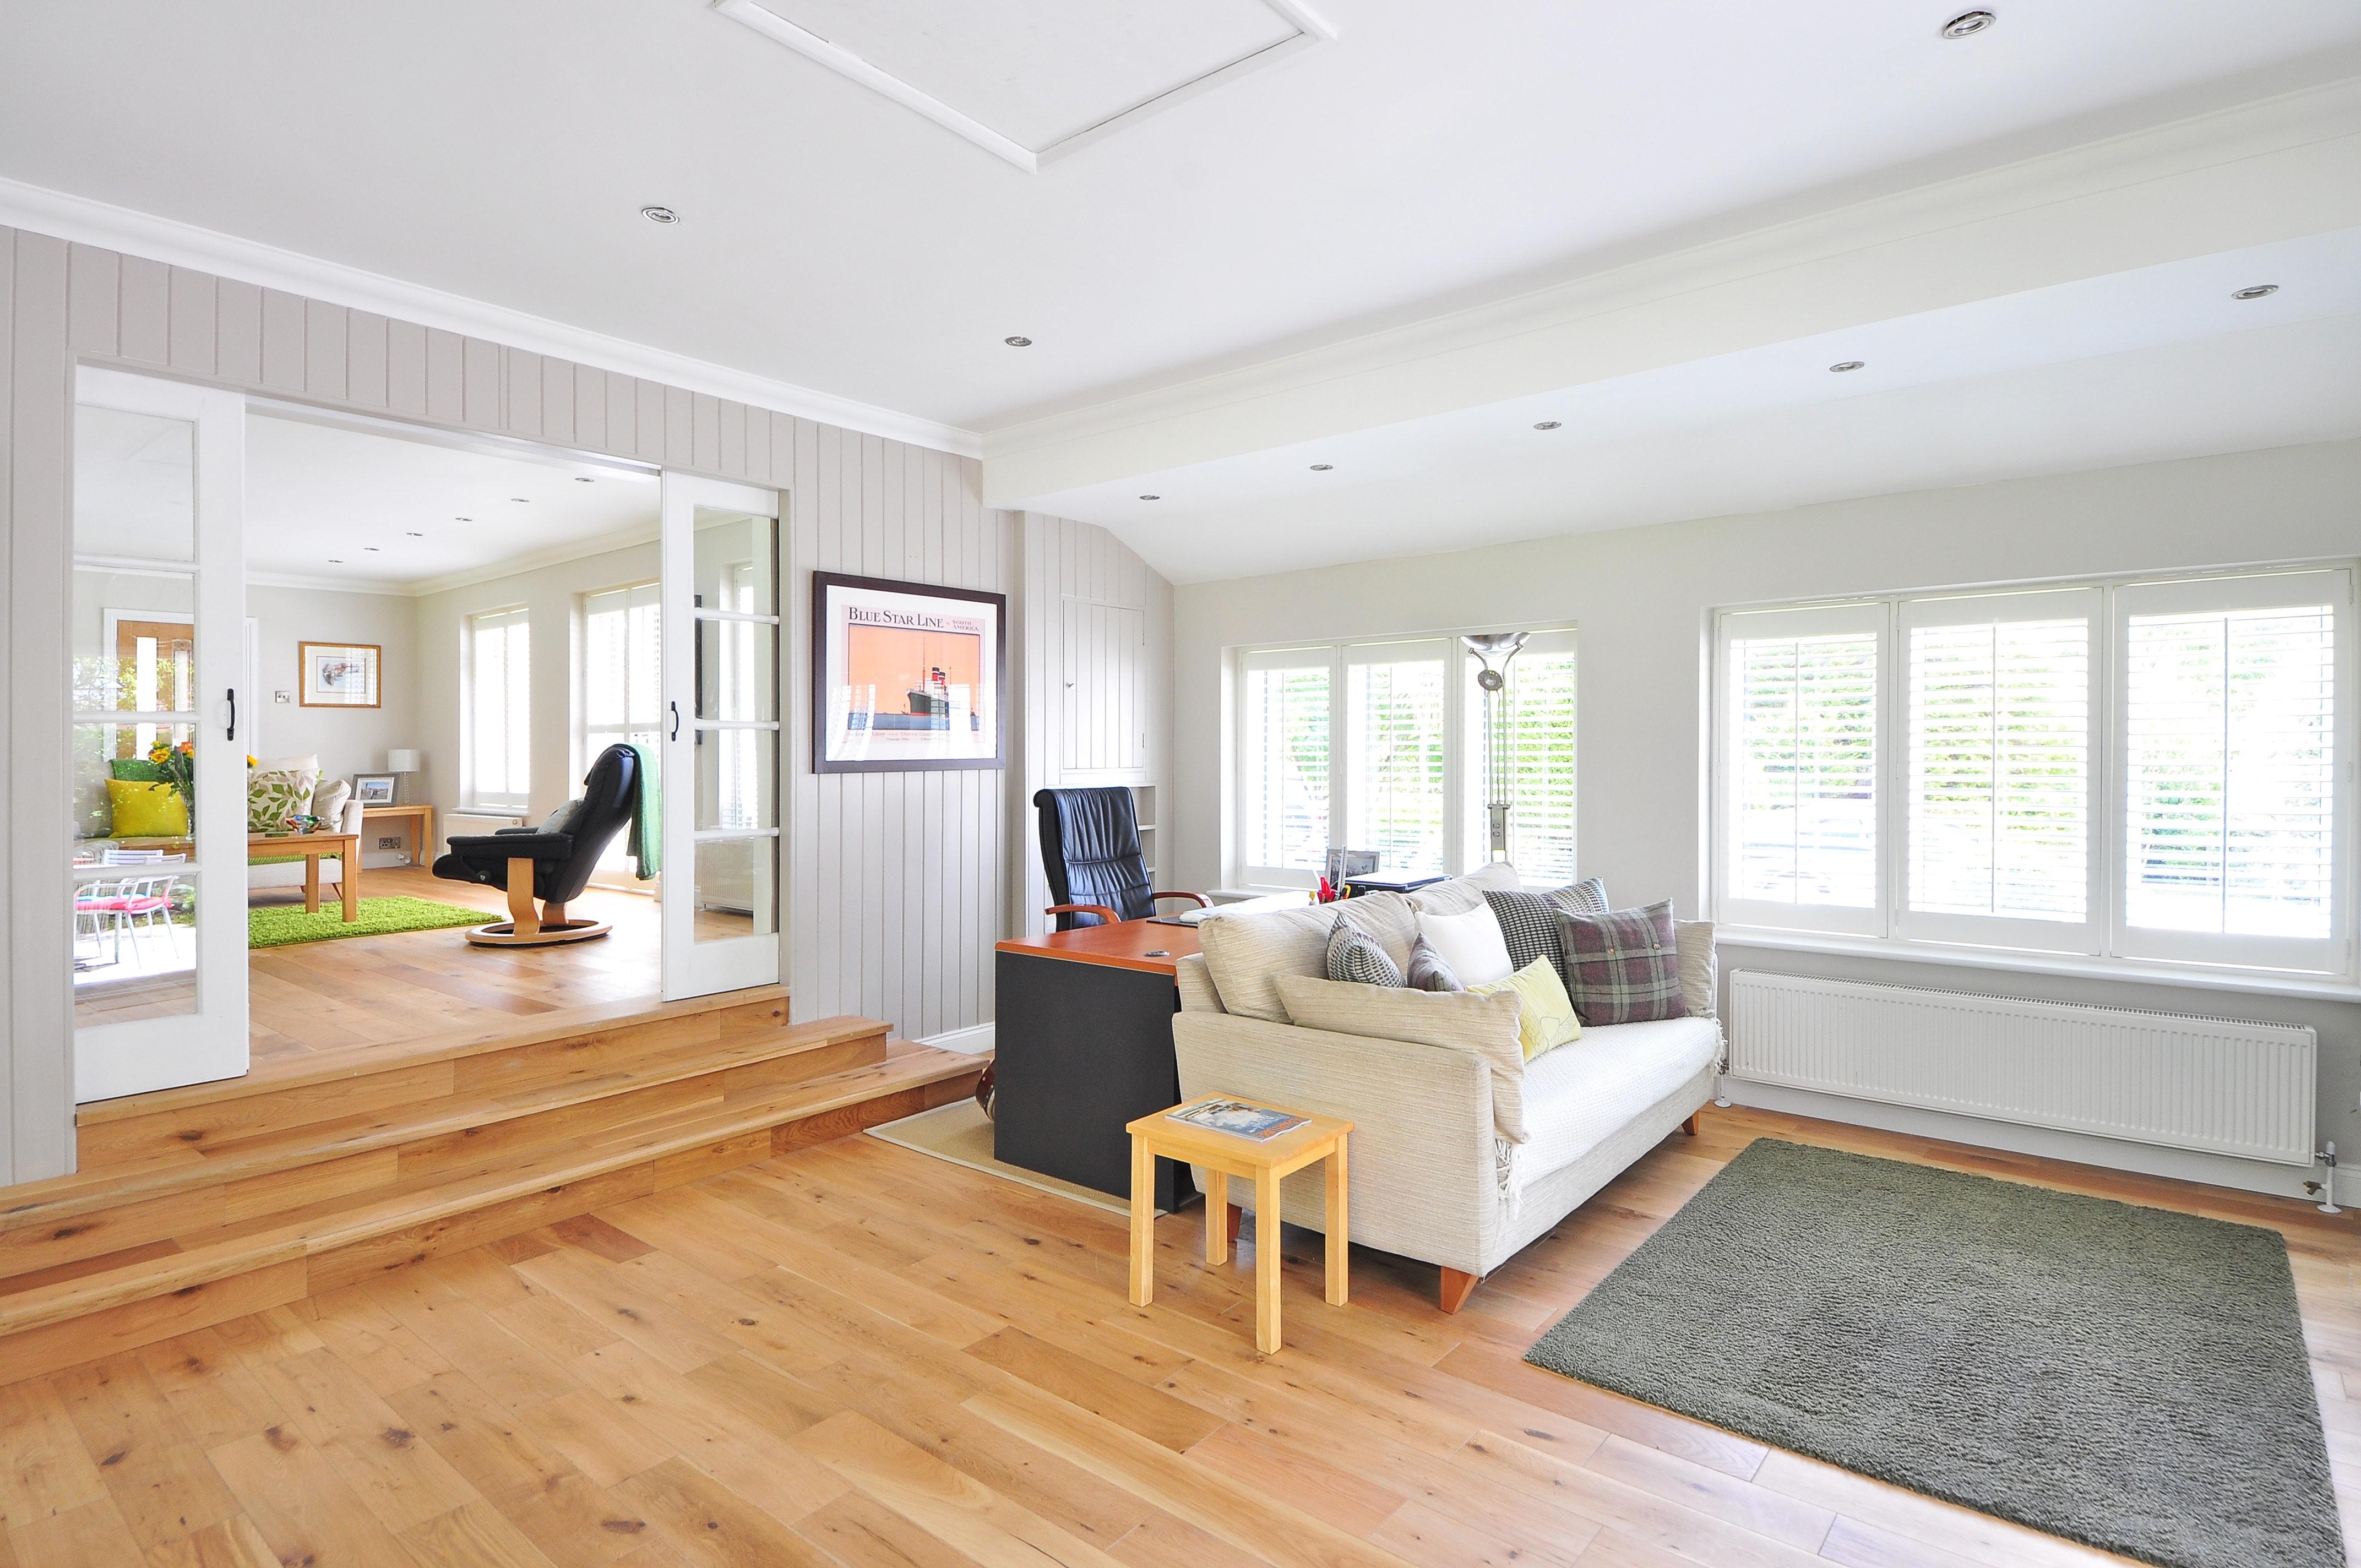 home decor trends, spring 2019, light wood floors